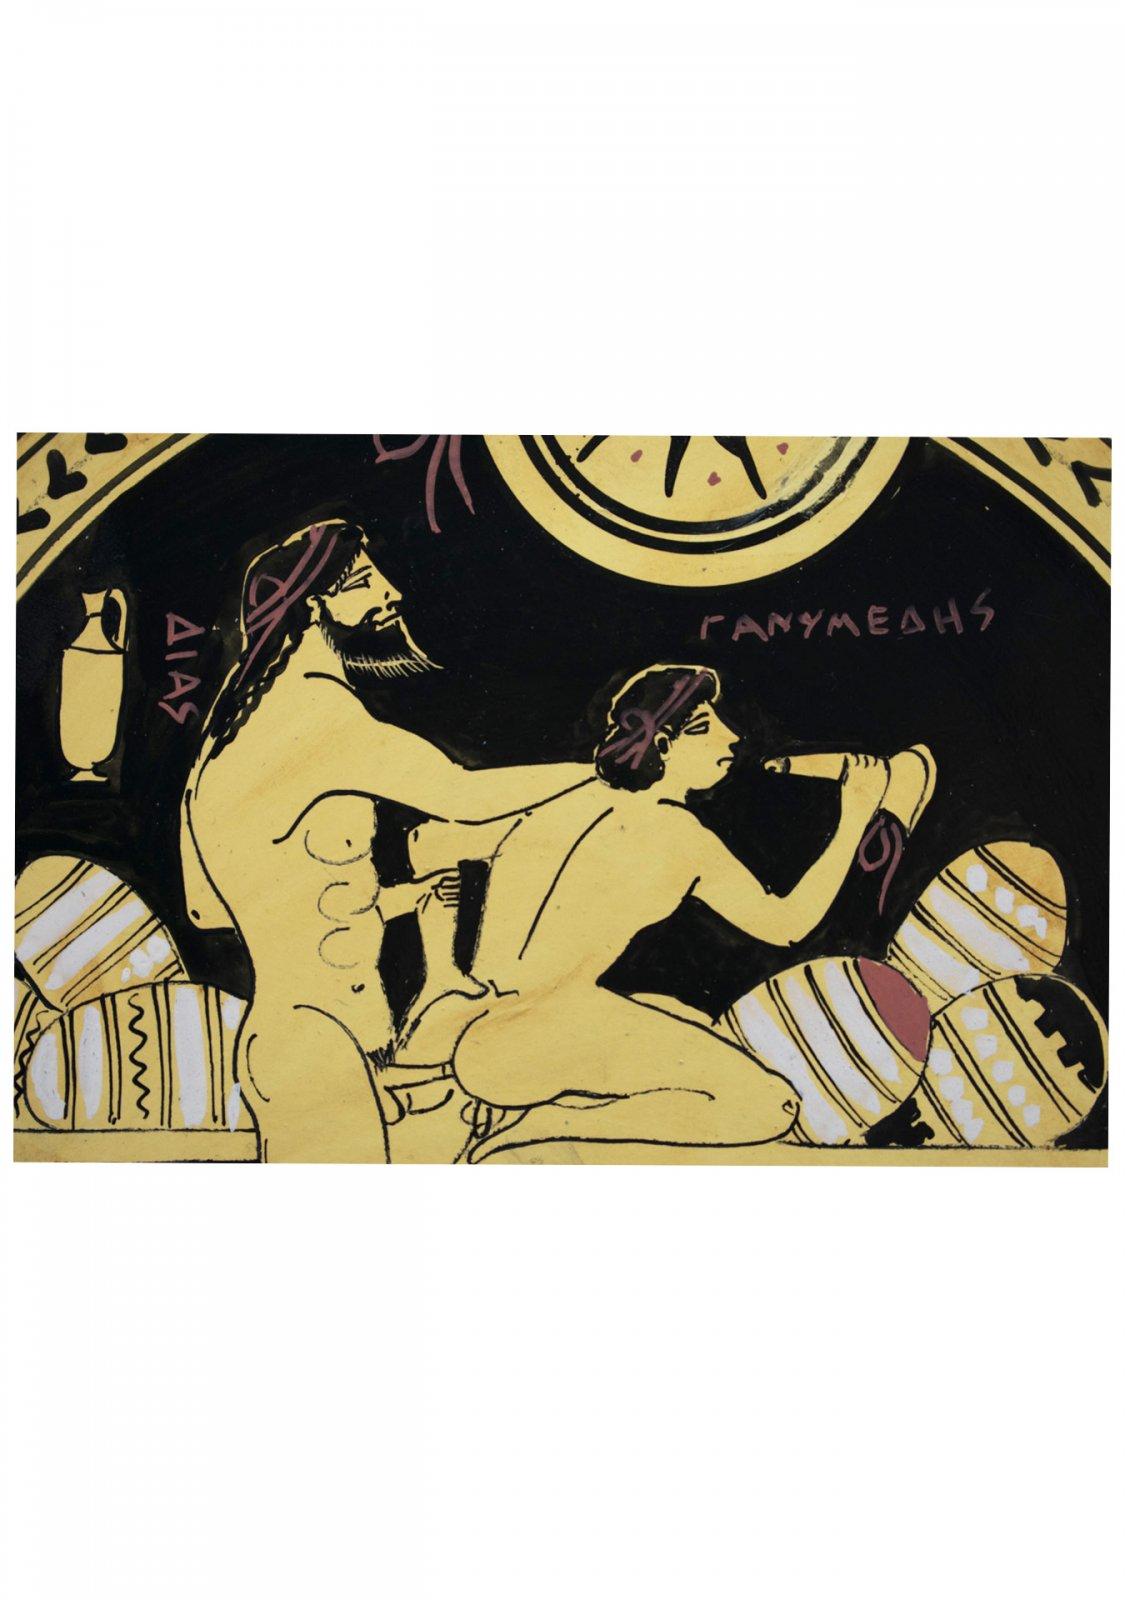 Classical Greek ceramic plate depicting Zeus and Ganymede